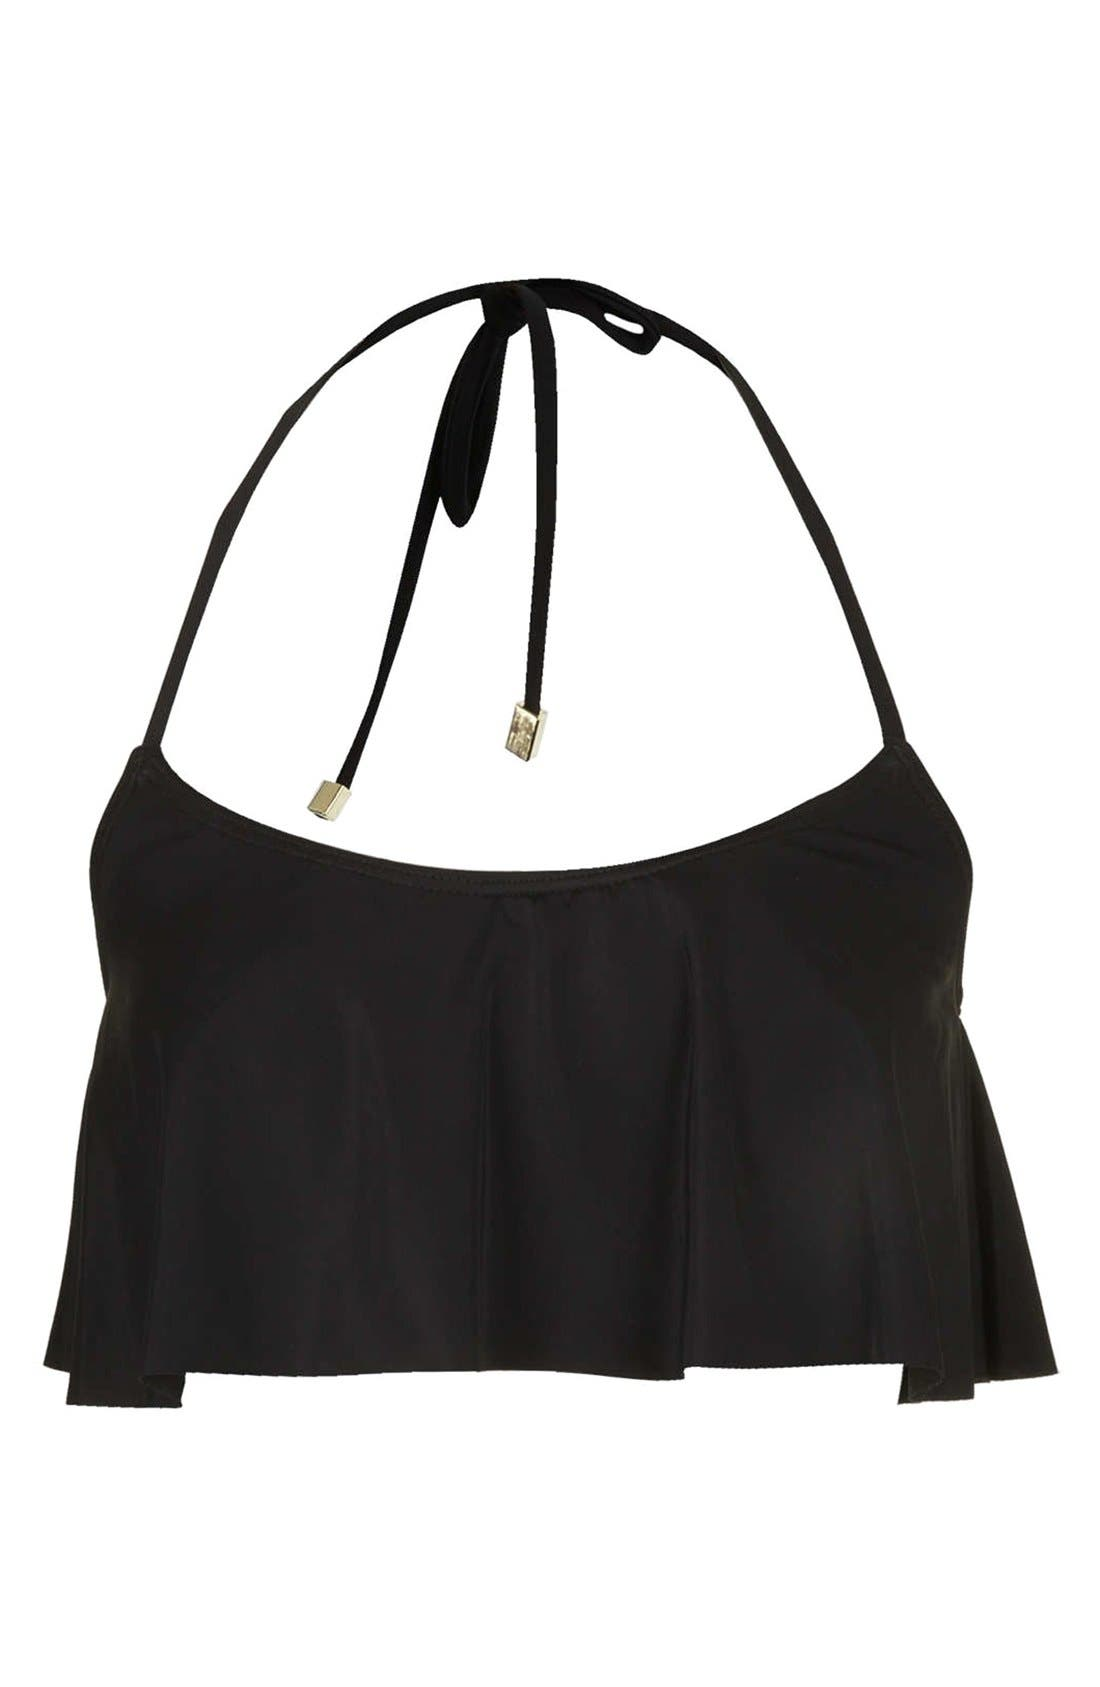 Alternate Image 1 Selected - Topshop Ruffle Tier Bikini Top